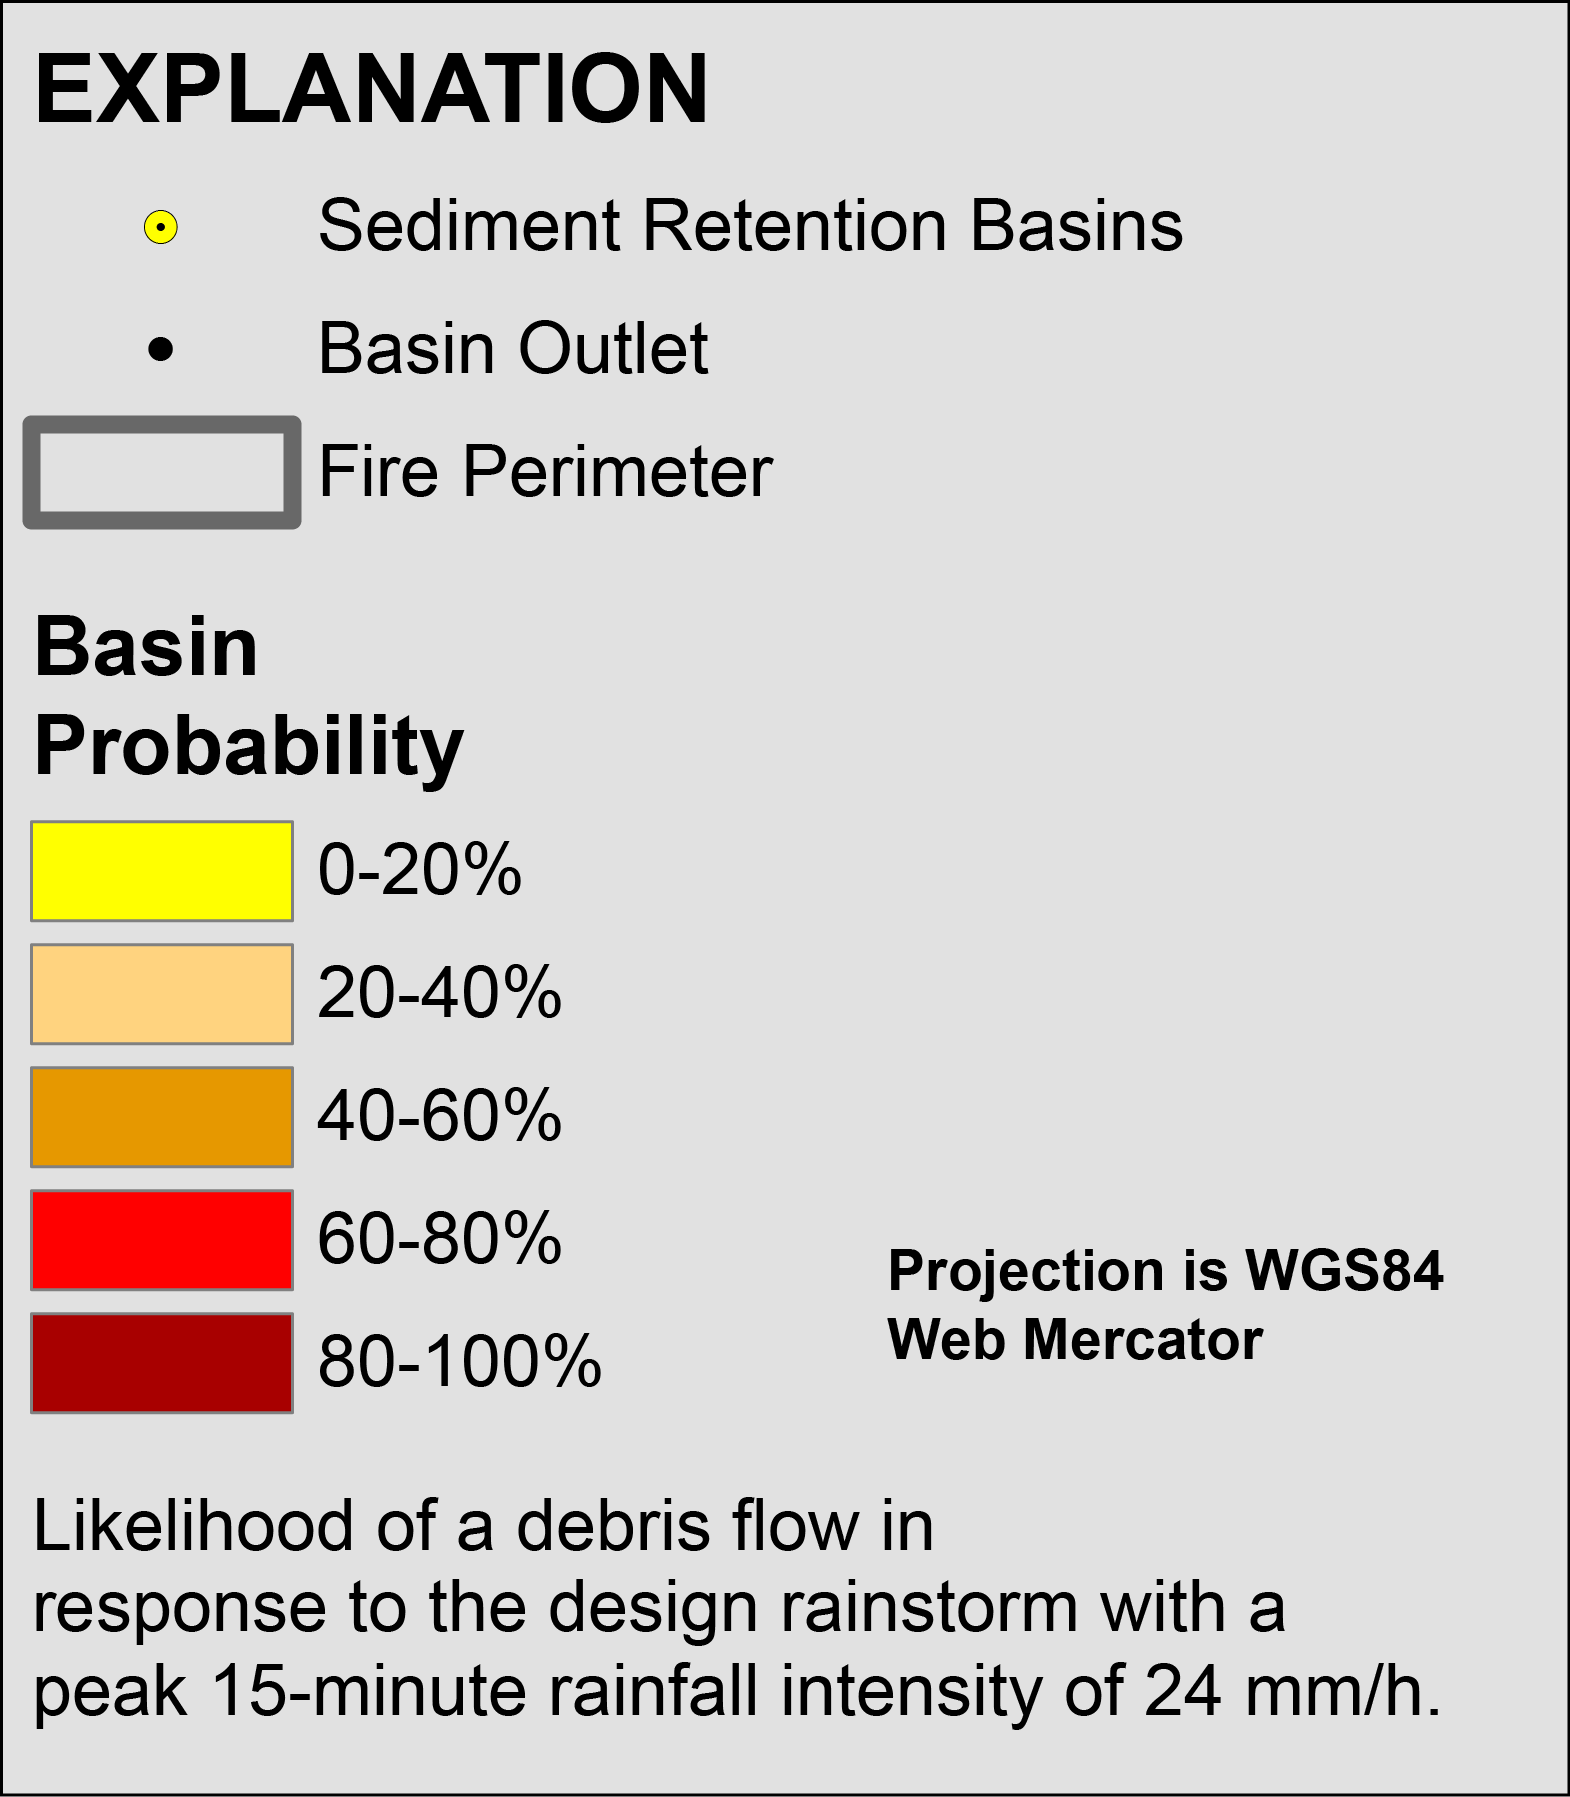 Emergency Assessment of Post-Fire Debris-Flow Hazards